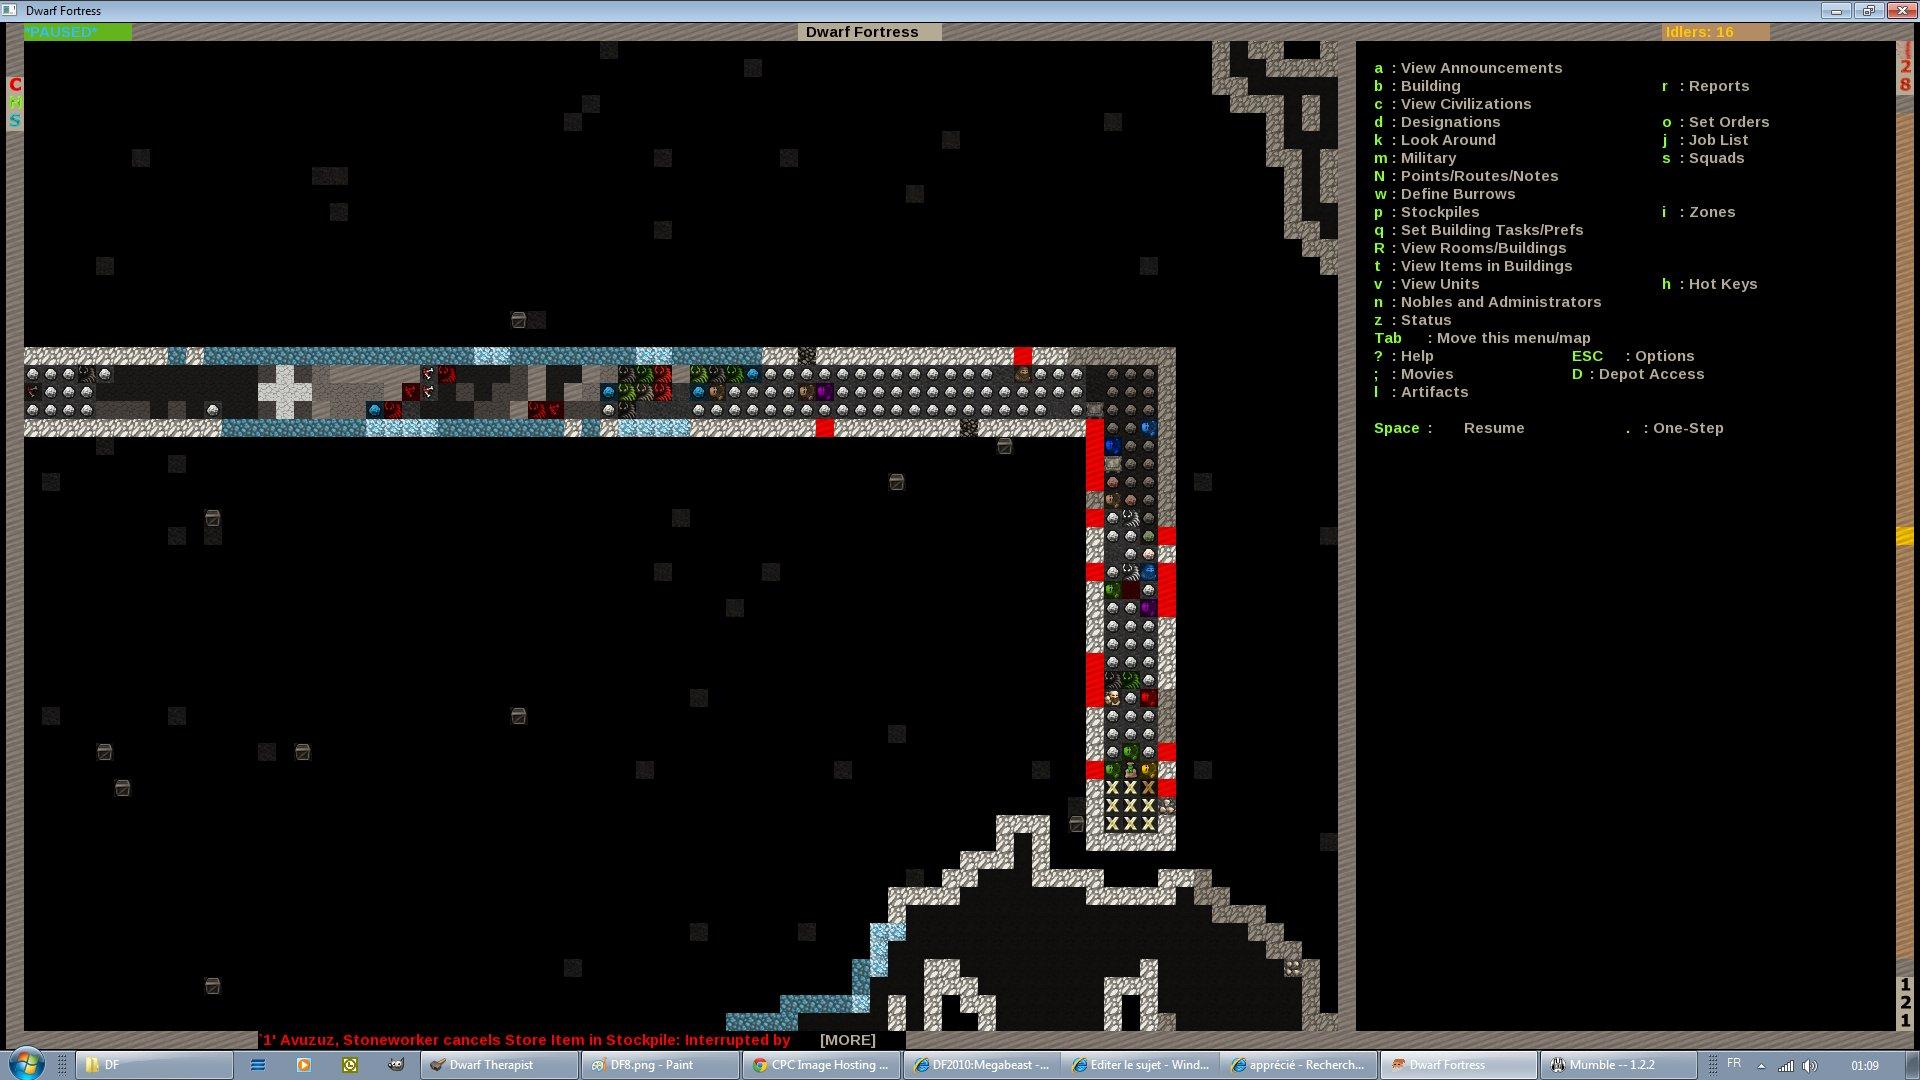 Dwarf Fortress  - Page 2 5da62998-5104-4375-ba78-338f2dbc5e54